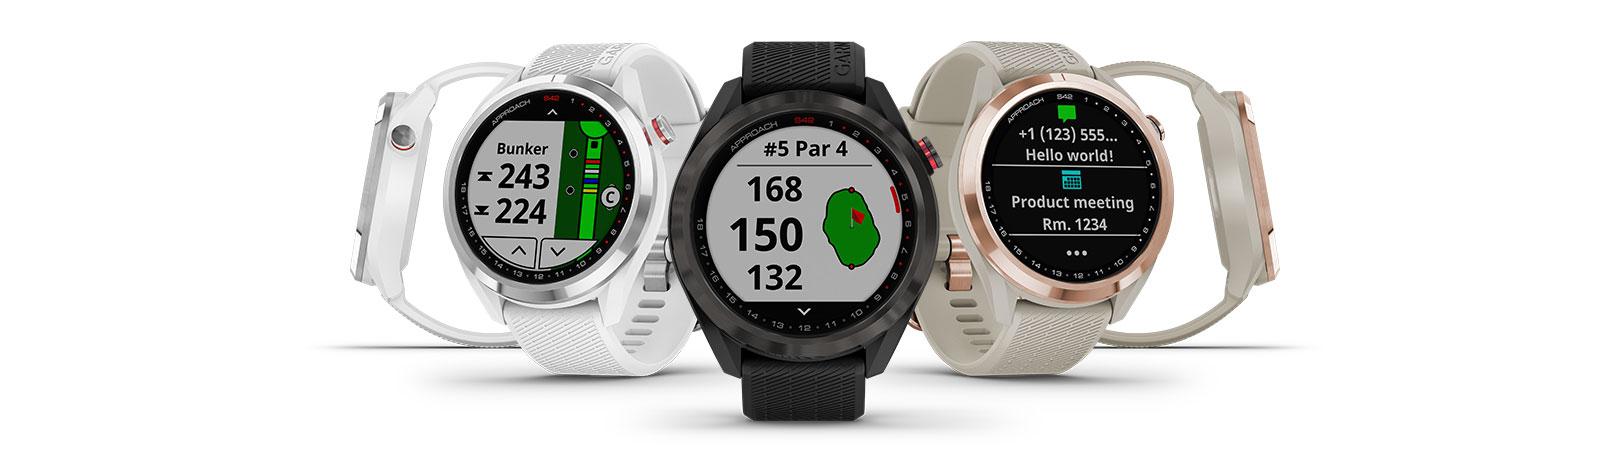 GARMIN golfové hodinky Approach S42 Black